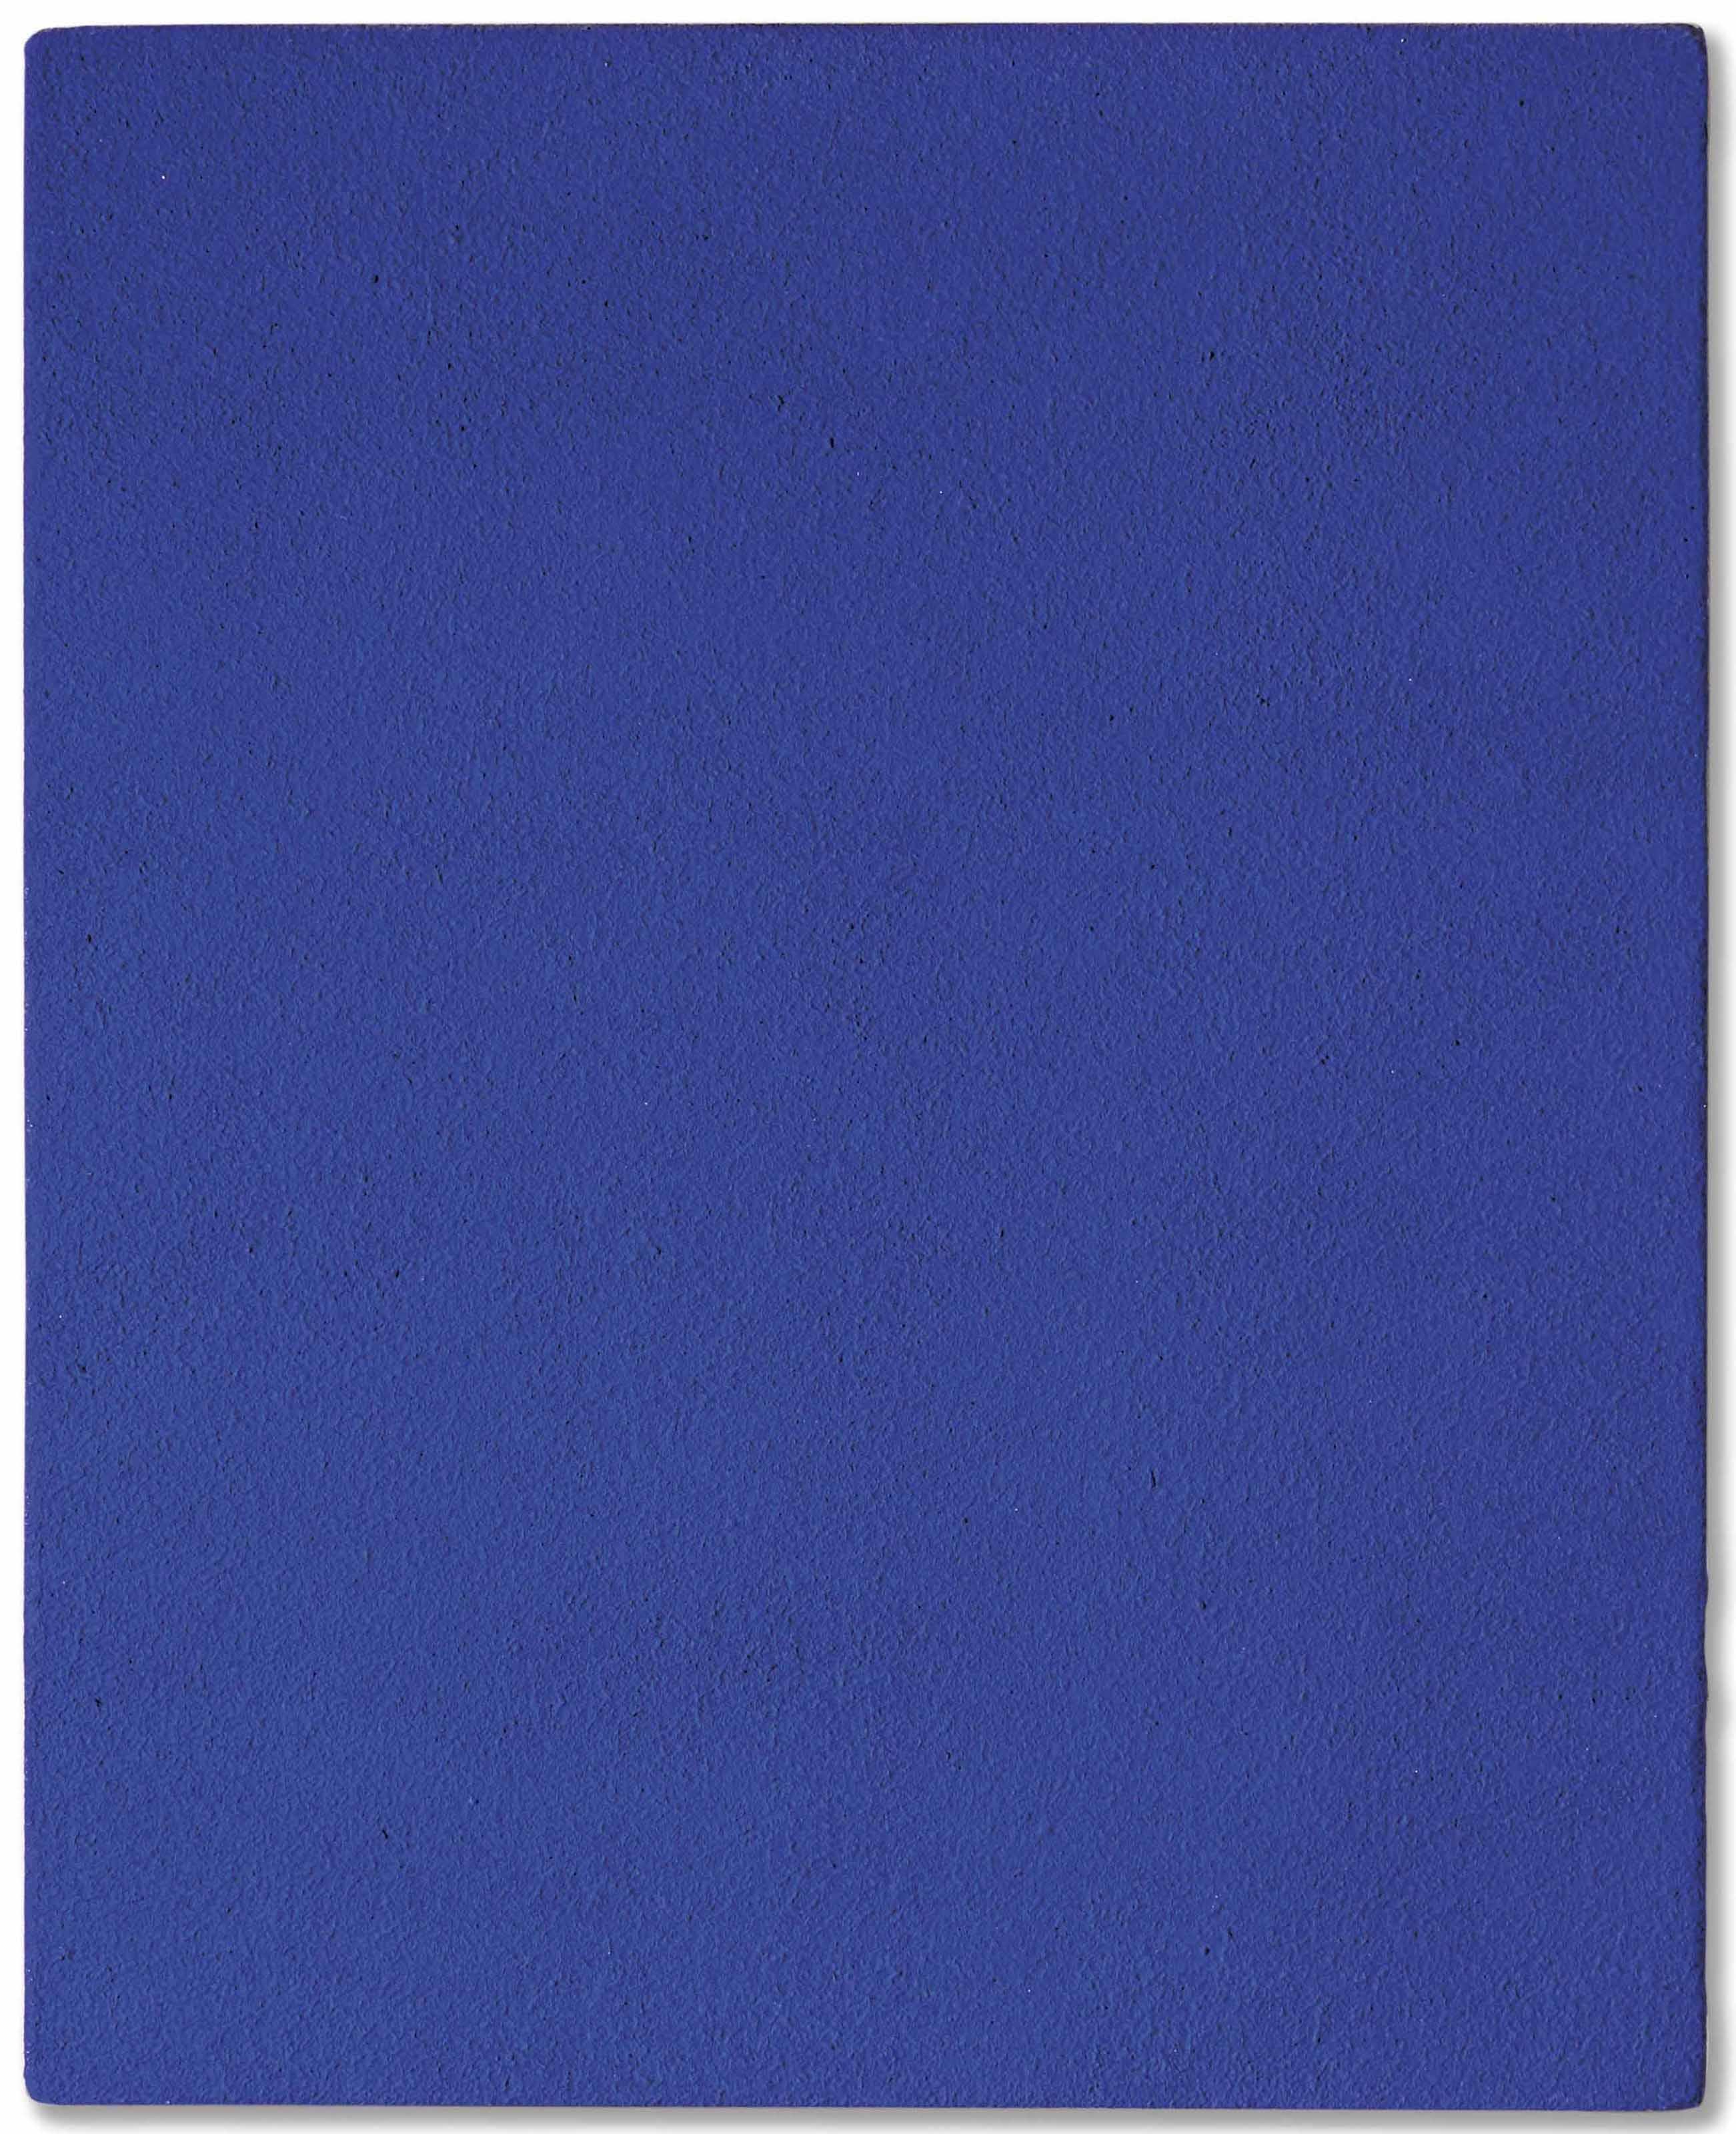 yves klein 1928 1962 monochrome bleu sans titre ikb. Black Bedroom Furniture Sets. Home Design Ideas